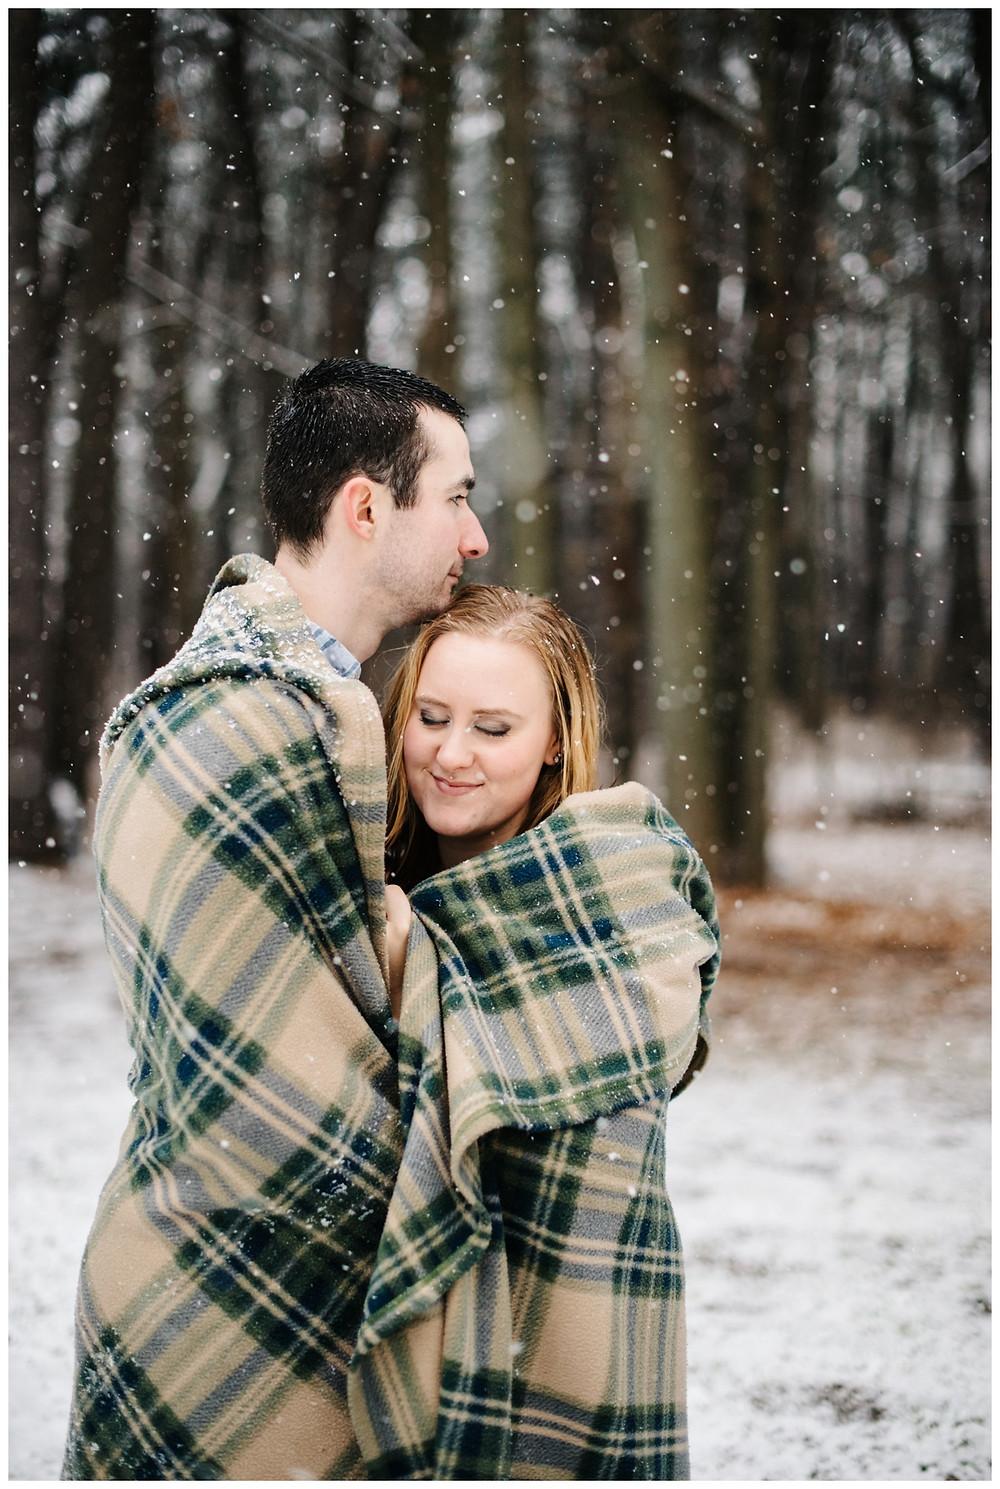 engaged-couple-snuggling-under-blanket-at-snowy-sheboygan-engagement-session-by-appleton-wedding-photographer-kyra-rane-photography